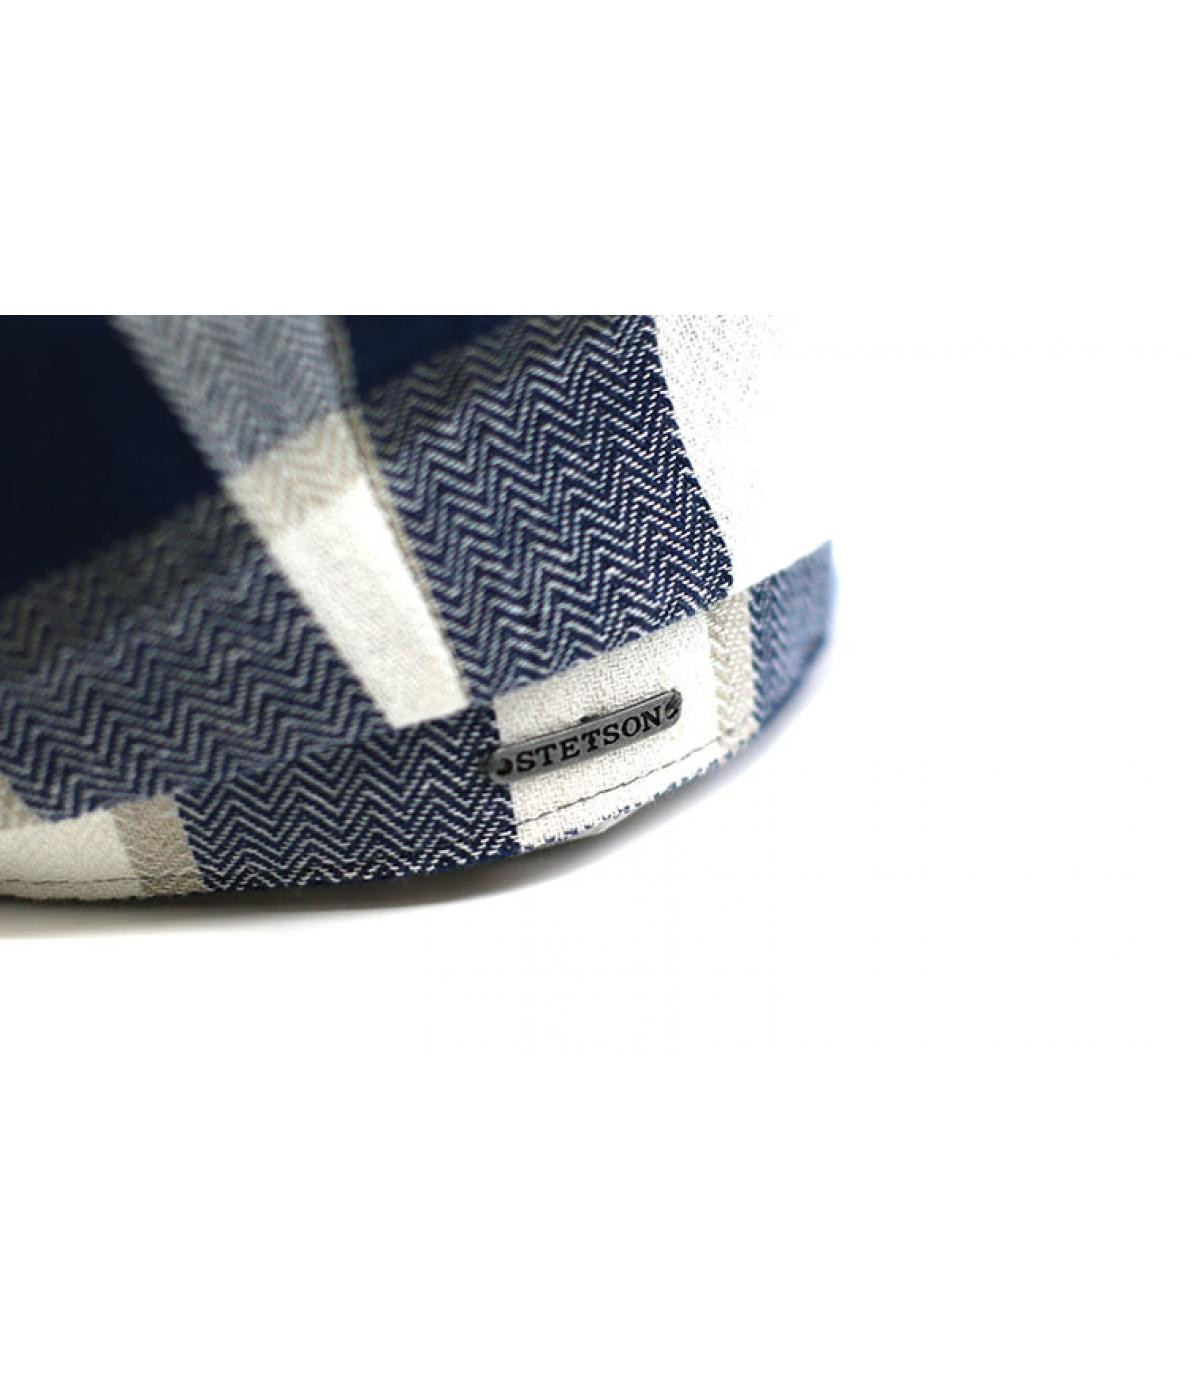 Details Hatteras Linen Check beige blue - Abbildung 3